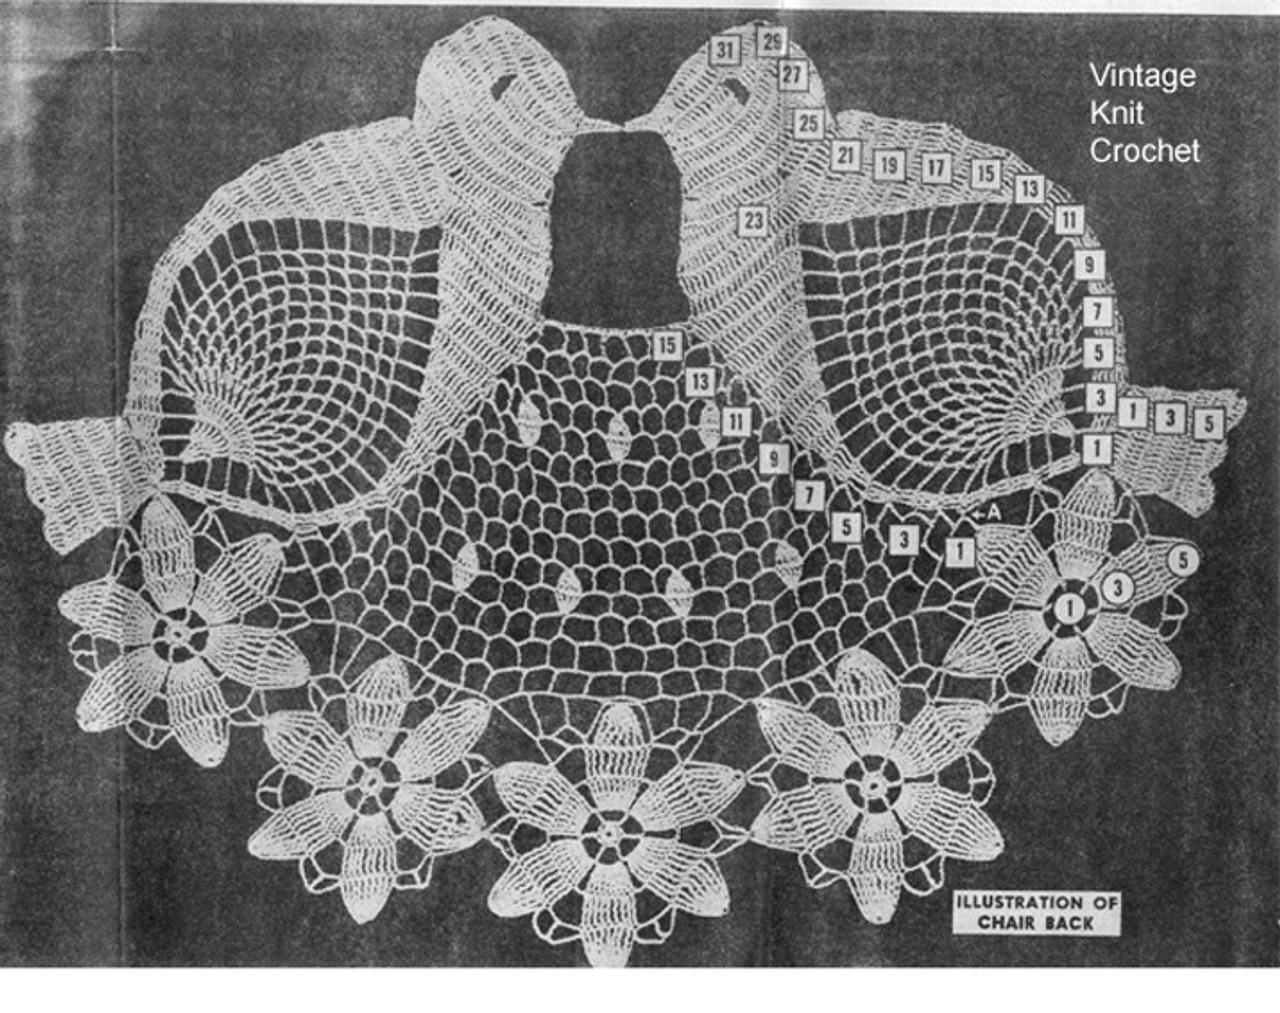 Bluebird crochet pattern stitch illustration, American Weekly 3164